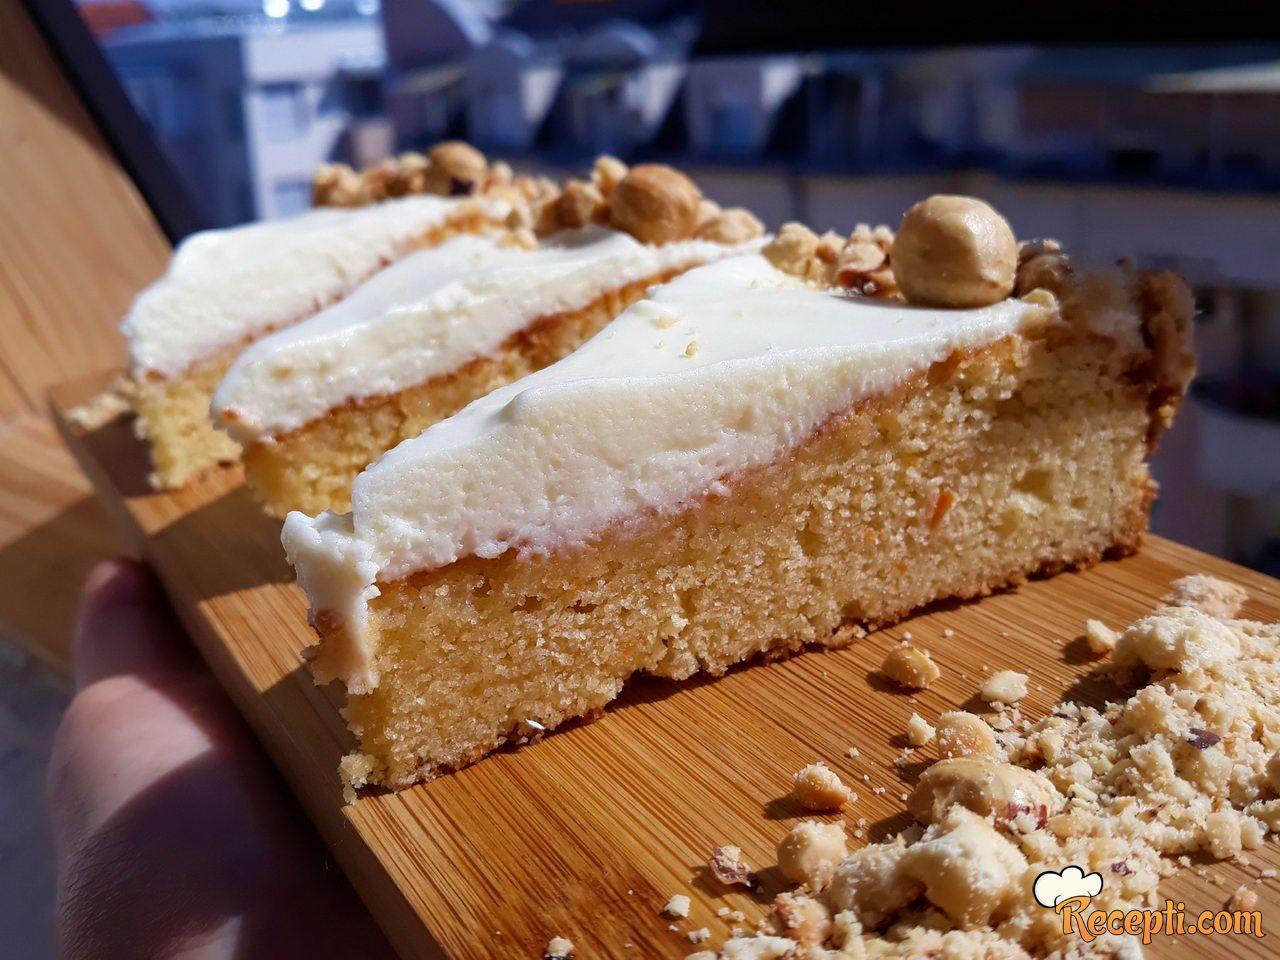 Torta sa šargarepom (Carrot Cake)